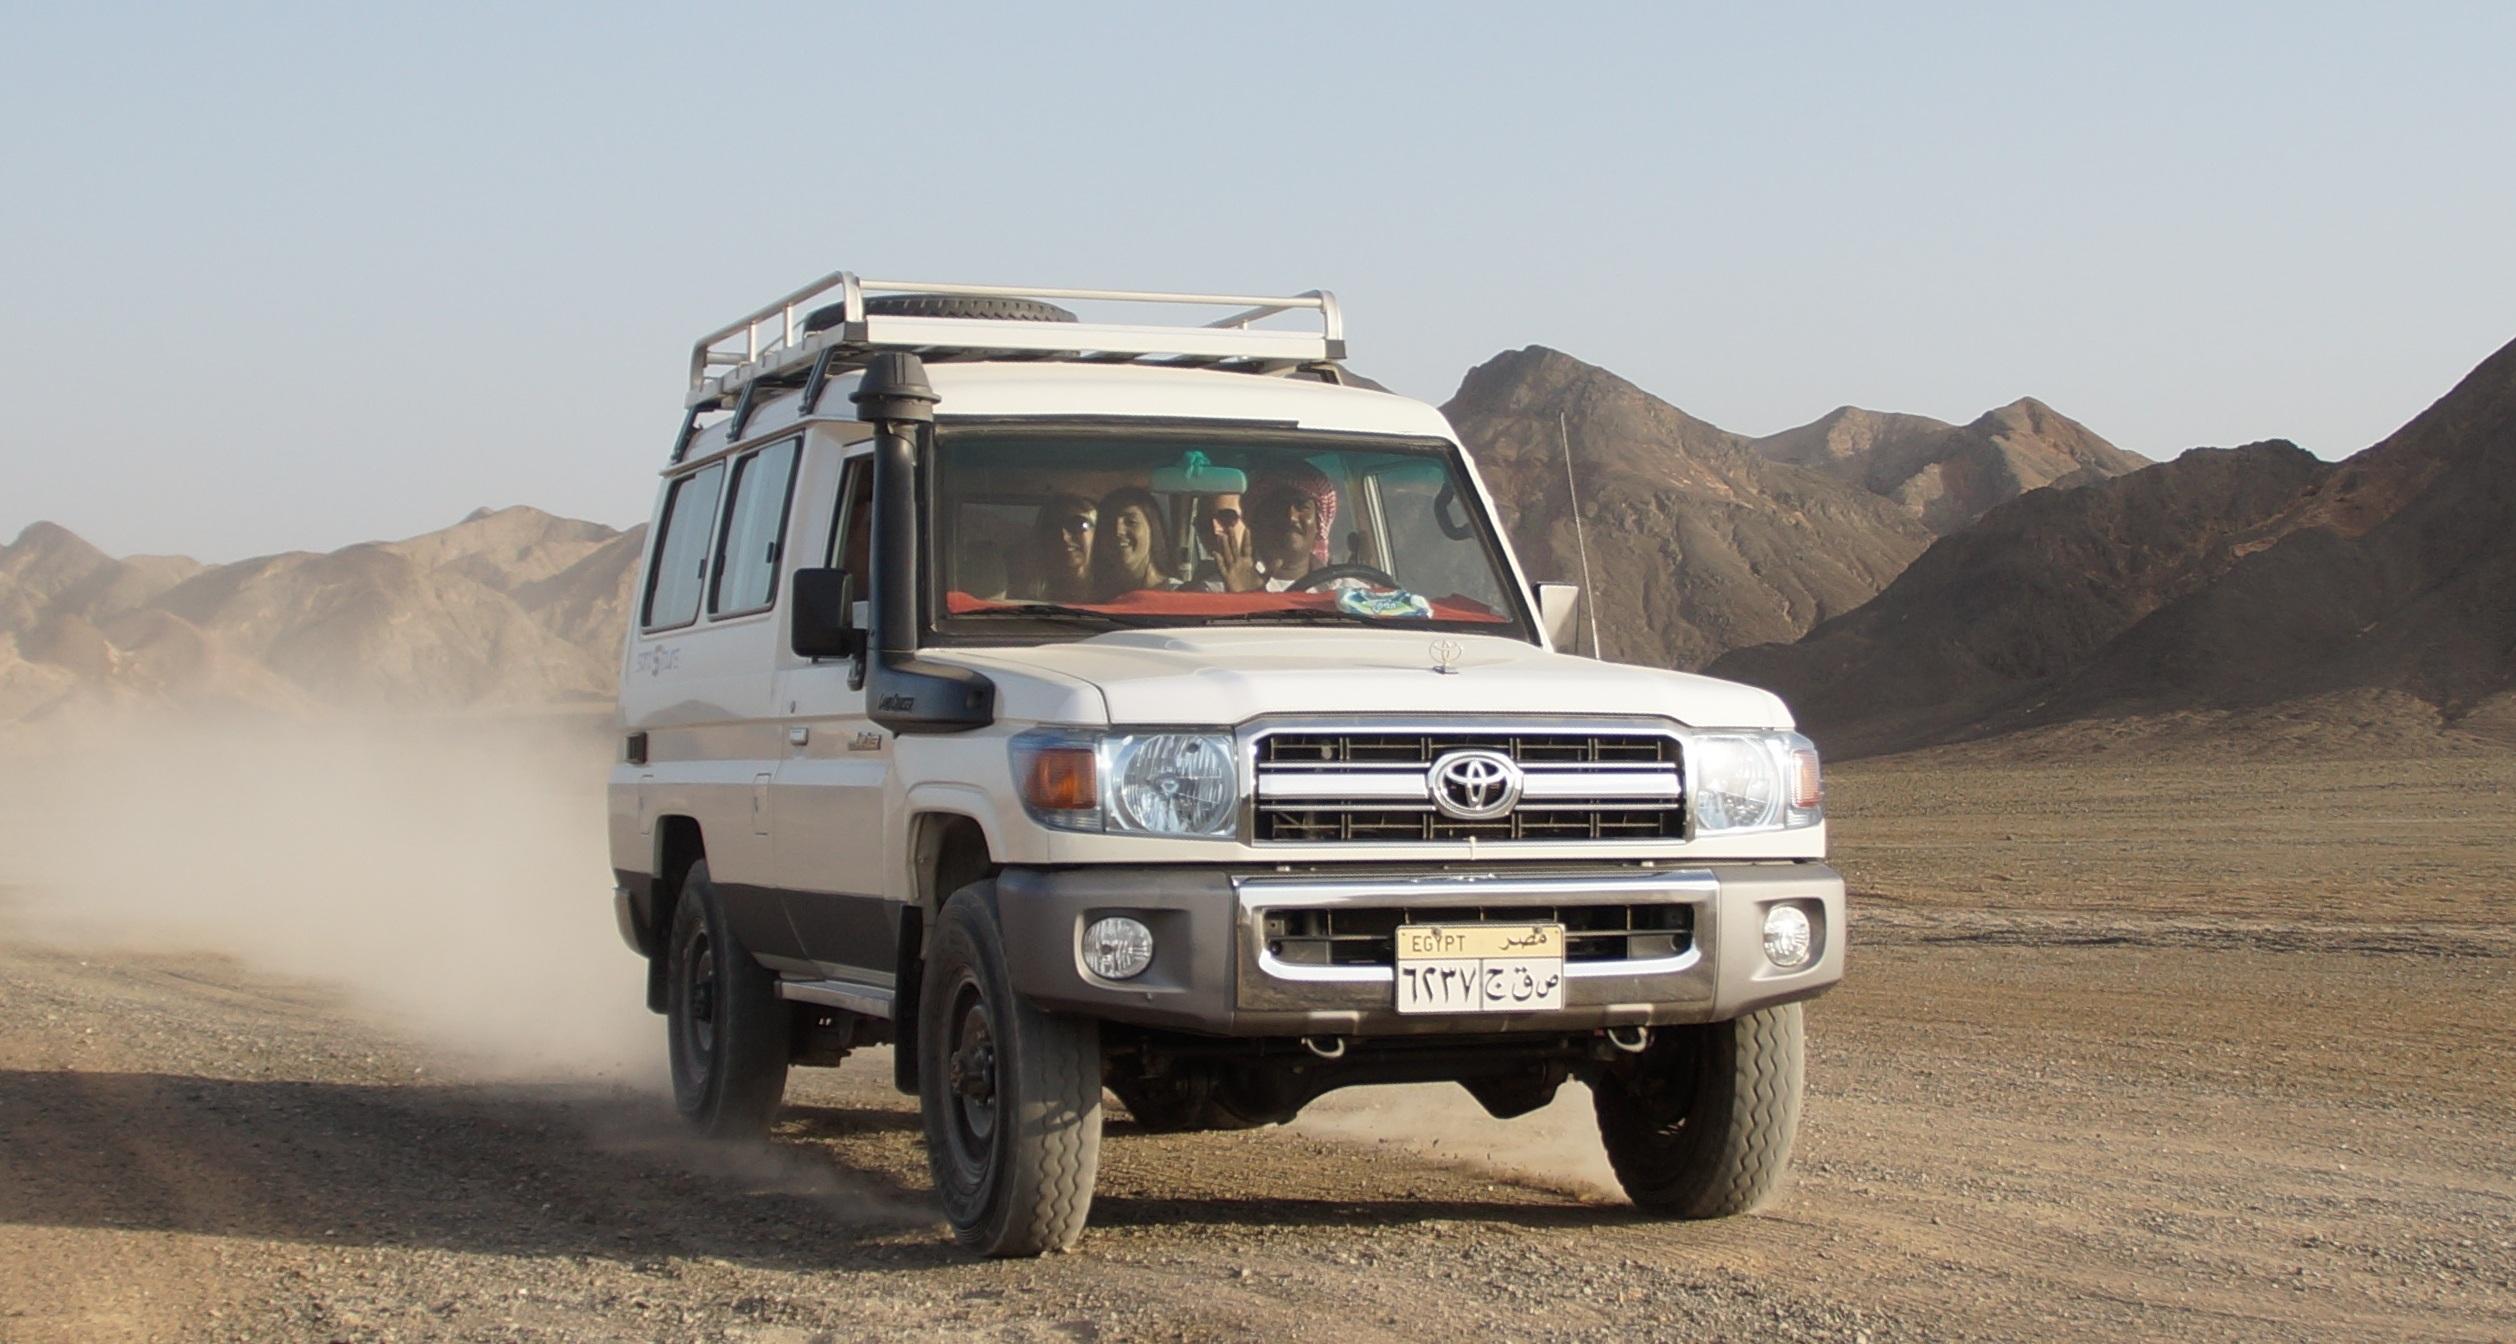 Free Images : Sand, Car, Adventure, Jeep, Trip, Bumper